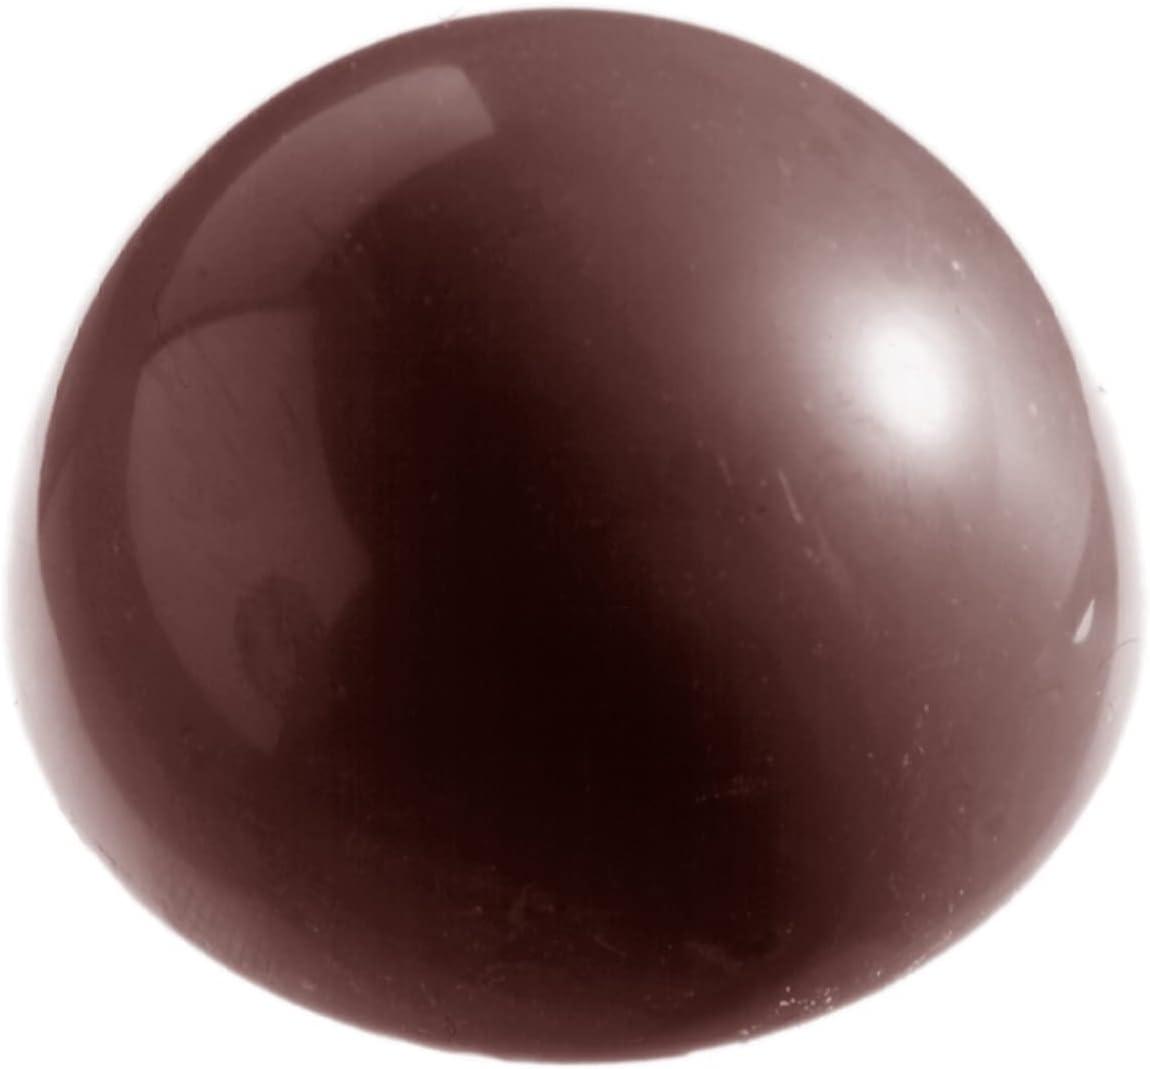 Chocolate Virginia Beach Mall World CW2253 Polycarbonate Candy SALENEW very popular Mold 6 with Hemispher